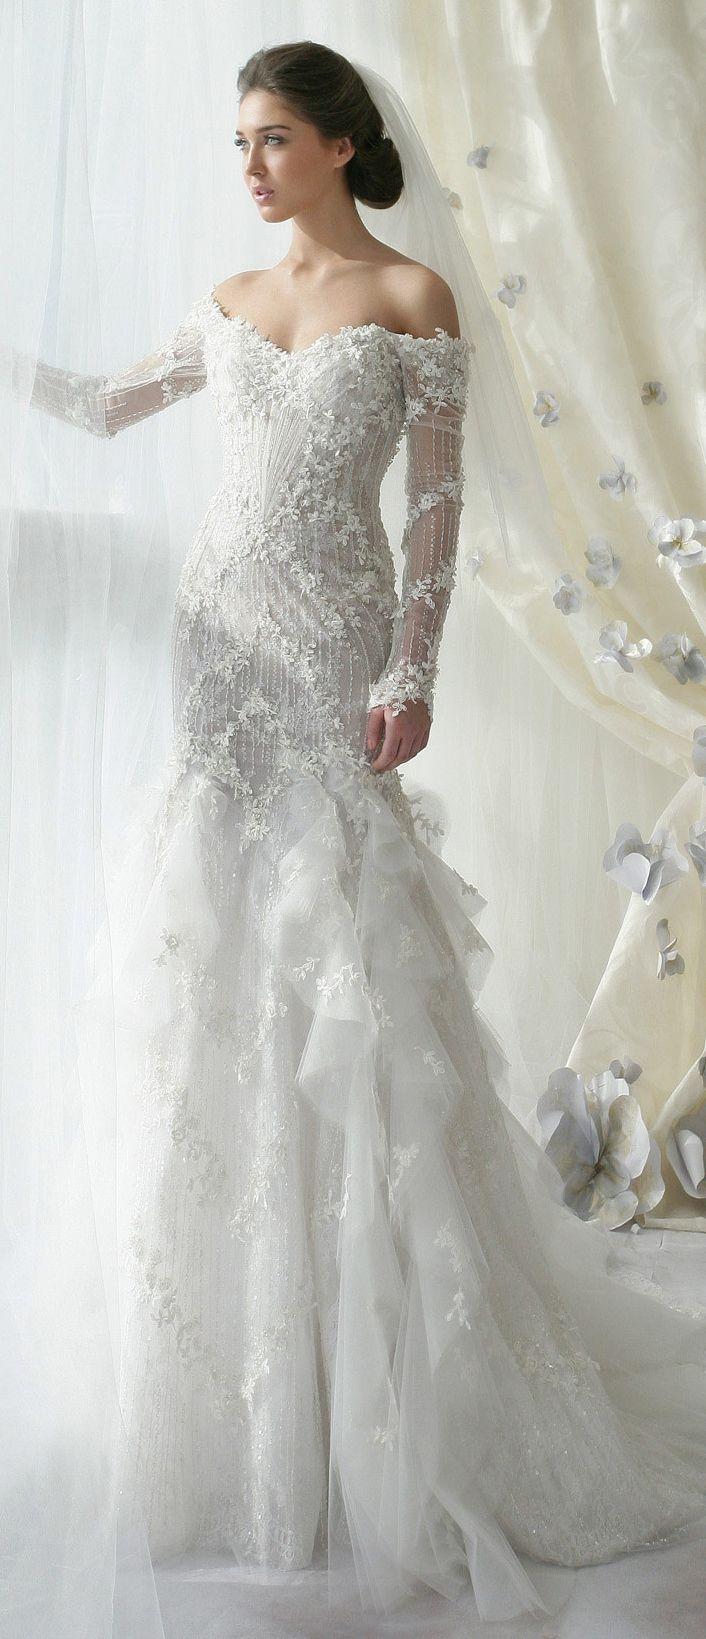 Editor's Pick: Ziad Nakad Wedding Dresses